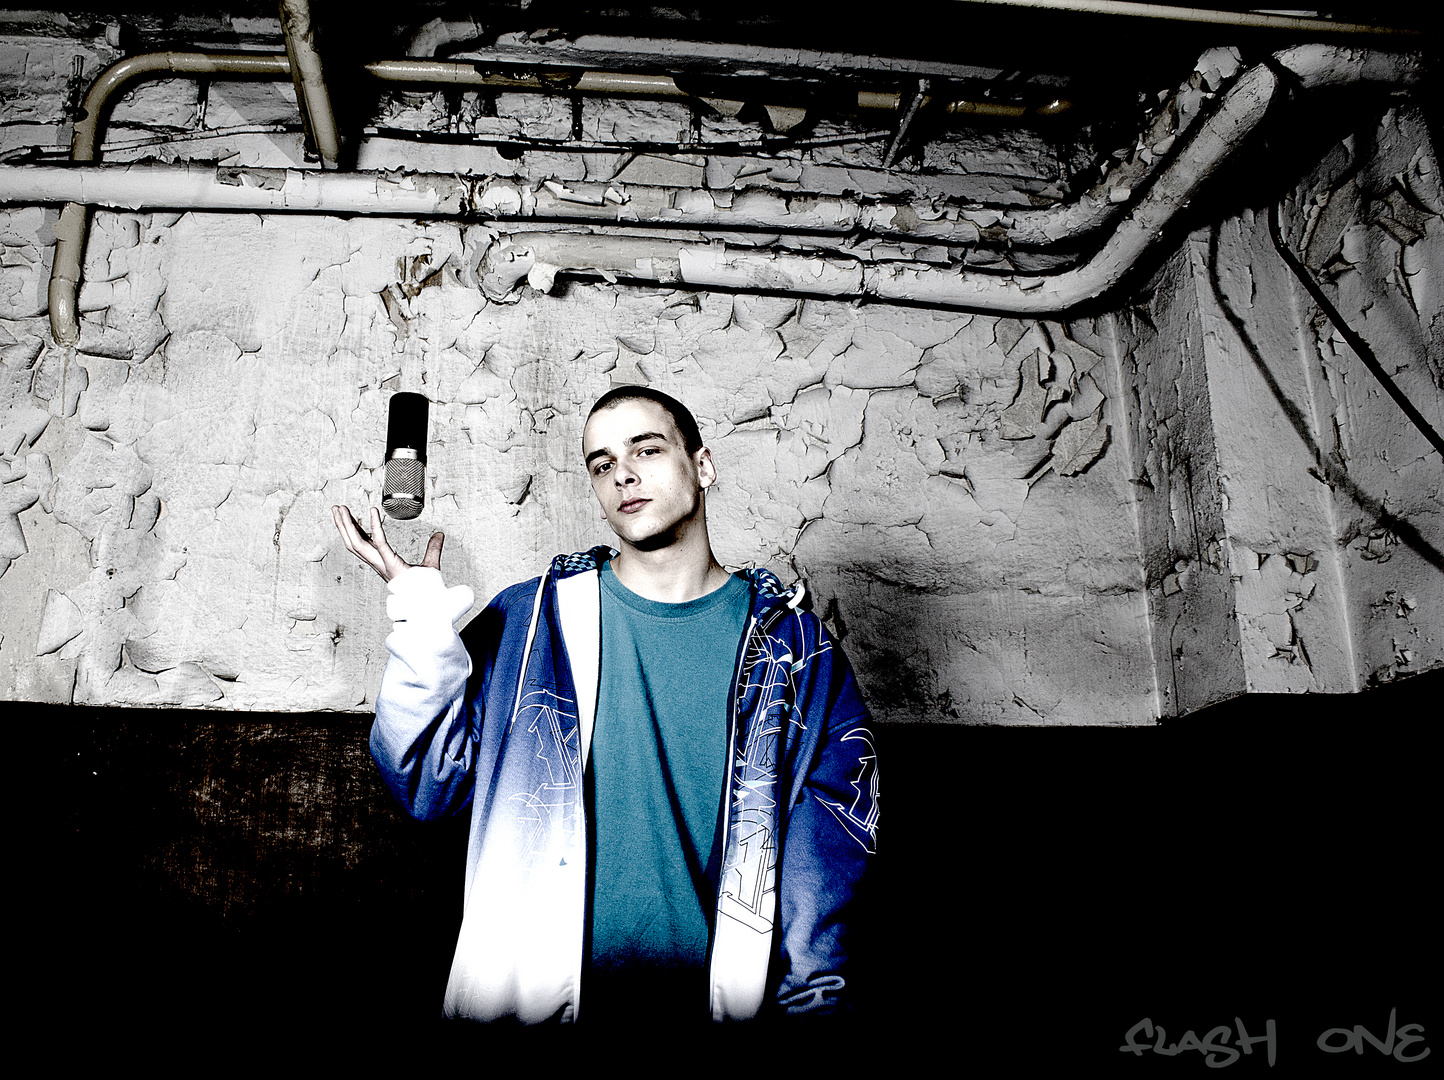 Flash One Rap aus Eberswalde